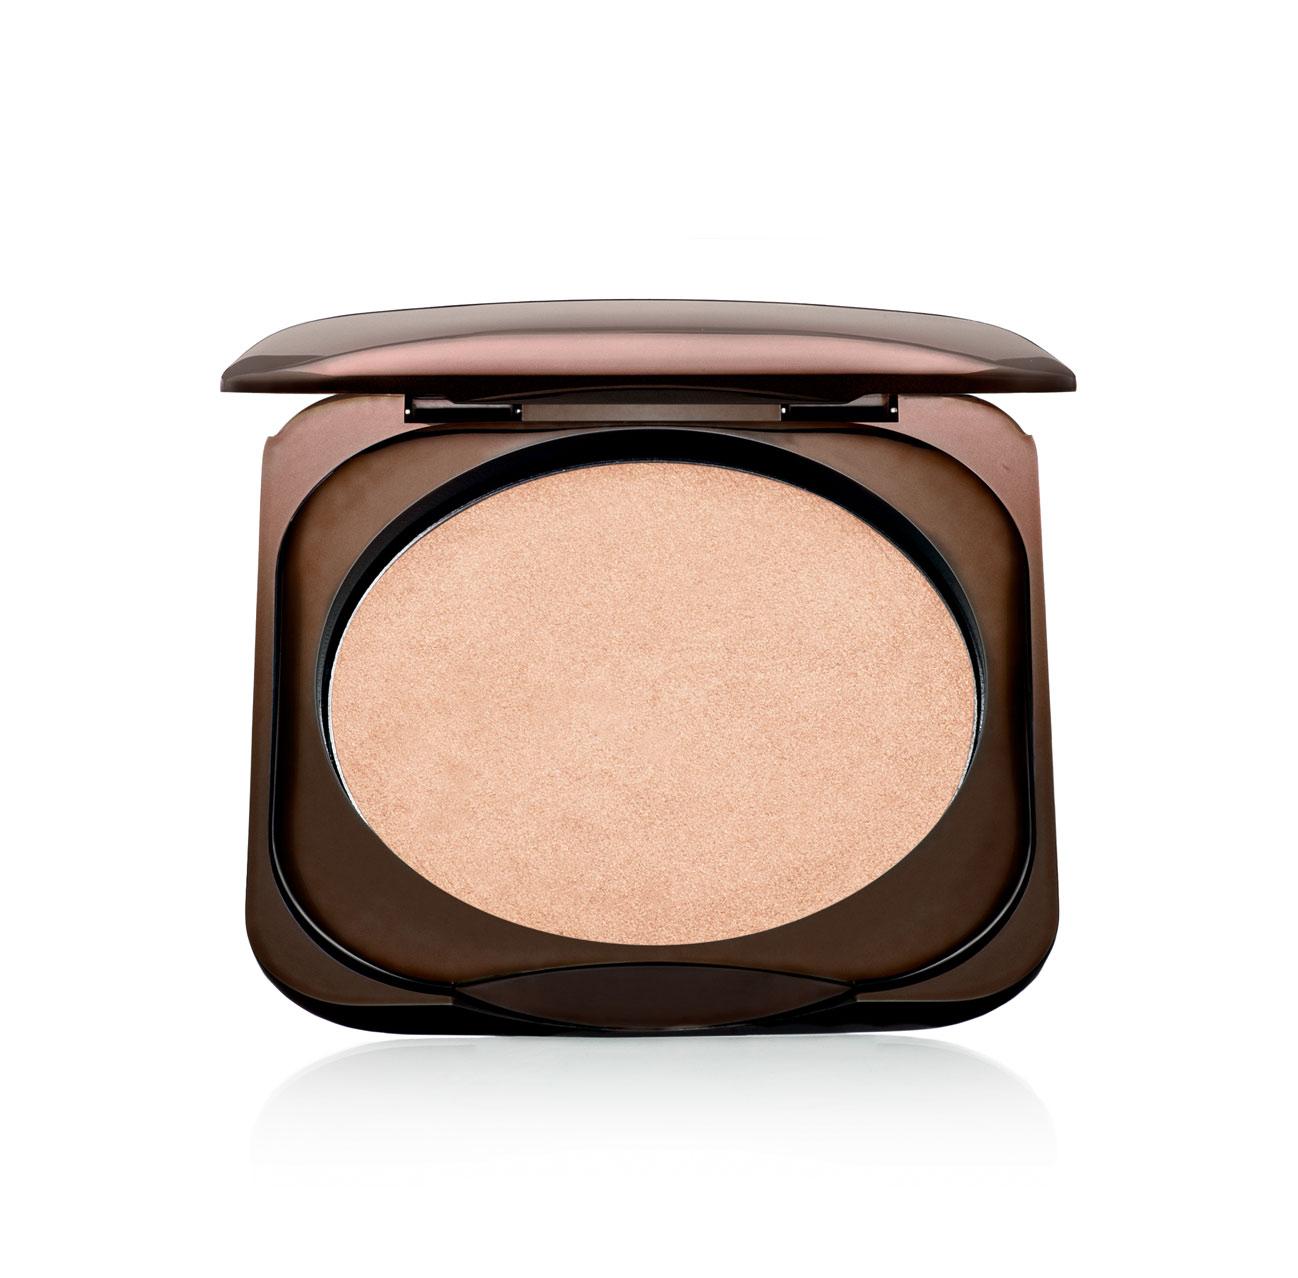 makeup-product-photography-0004.jpg